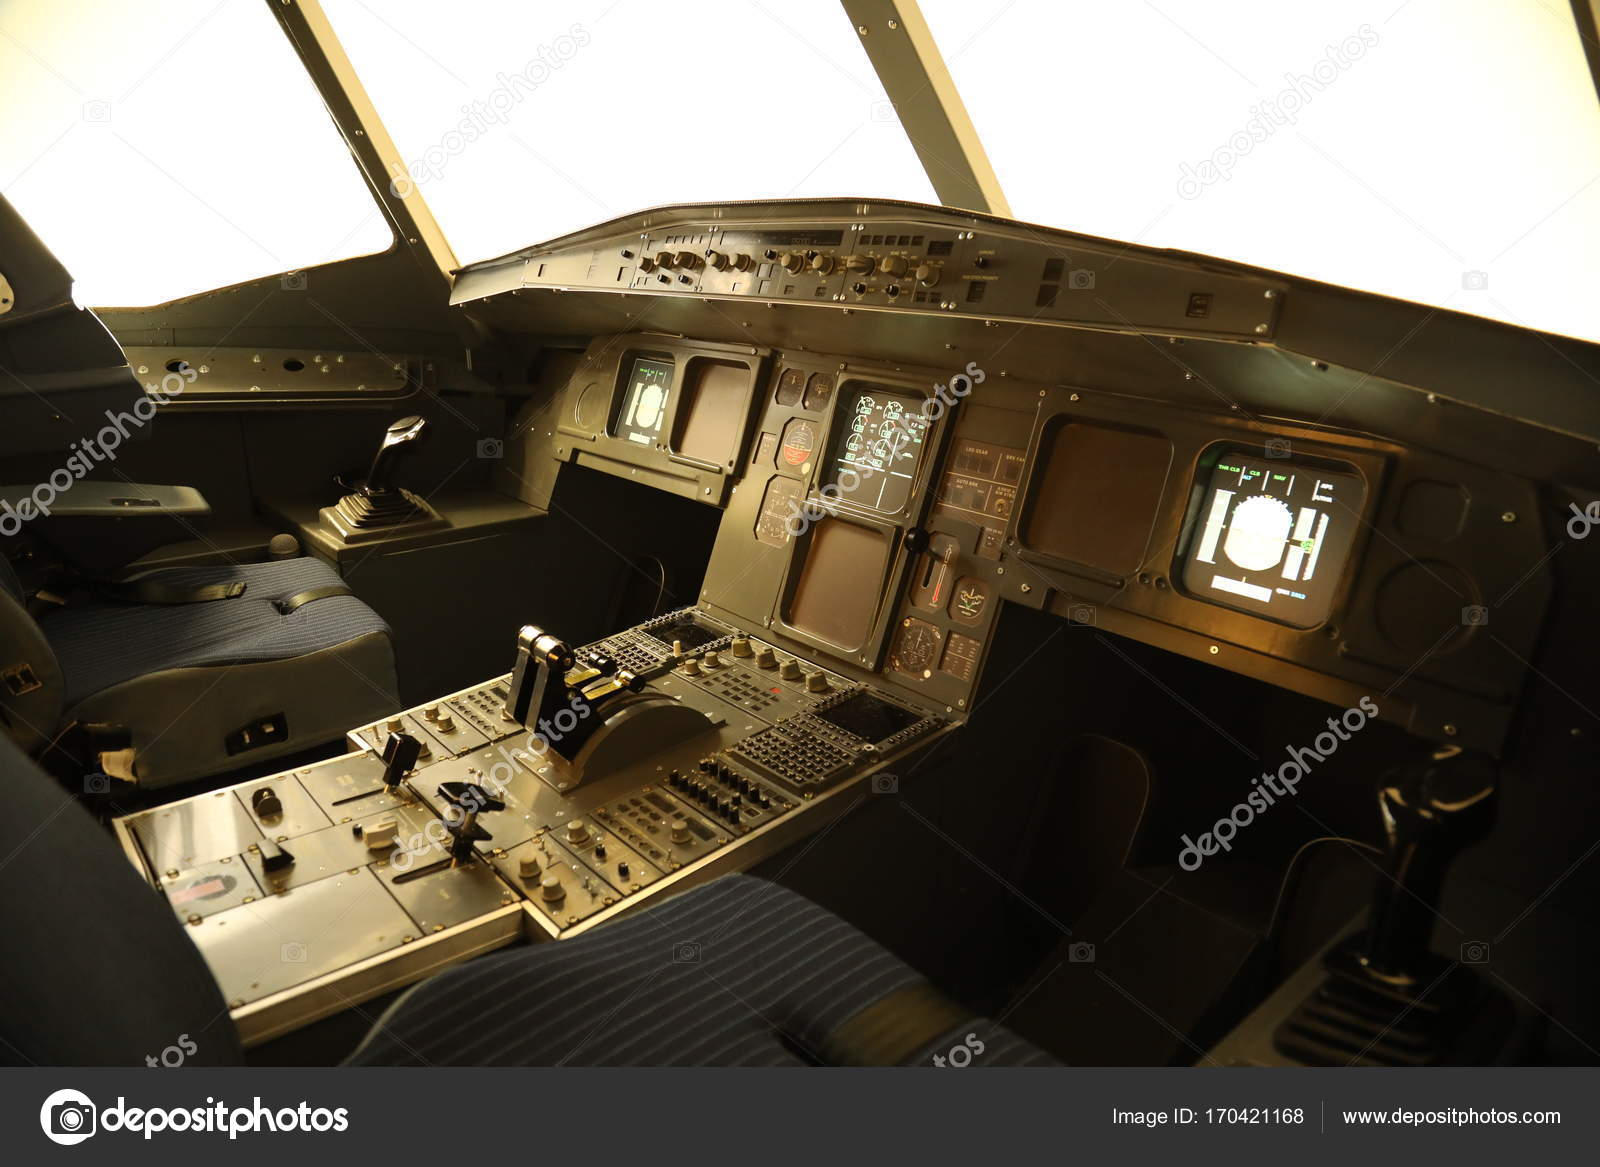 Flight Simulator for training pilots – Stock Editorial Photo